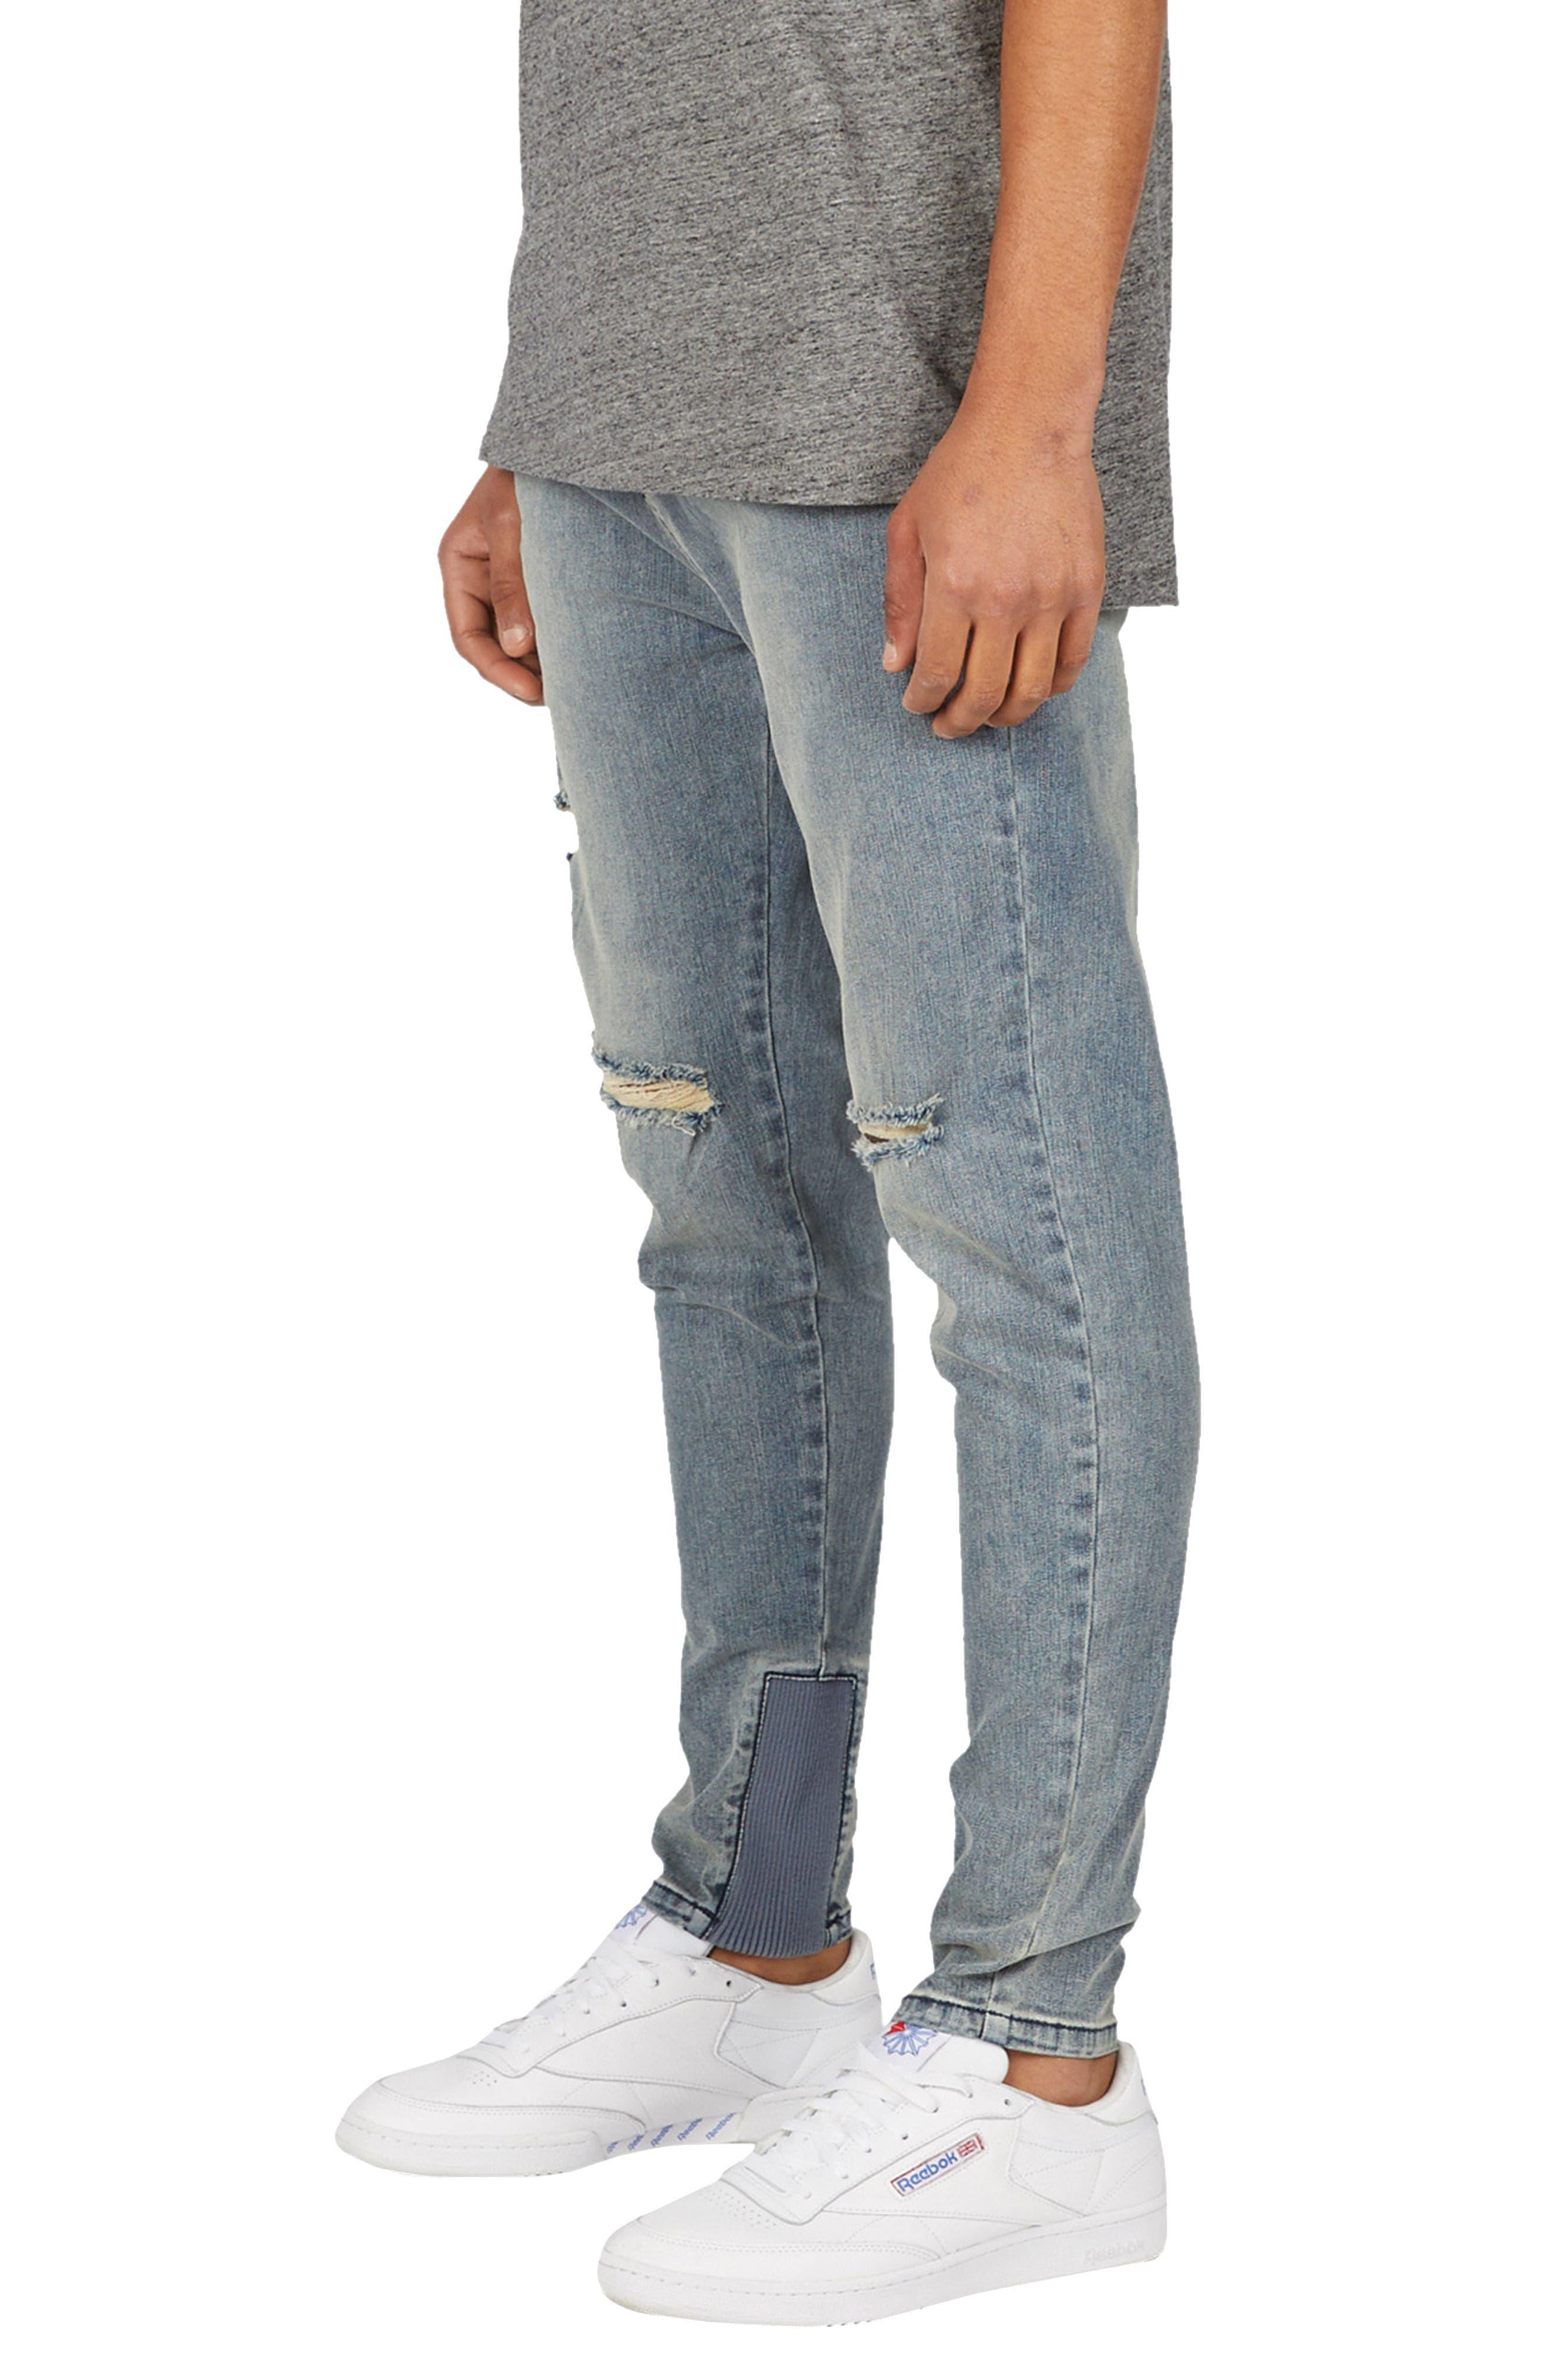 Sharpshot Slouchy Slim Fit Jeans,                             Alternate thumbnail 4, color,                             Double Indigo